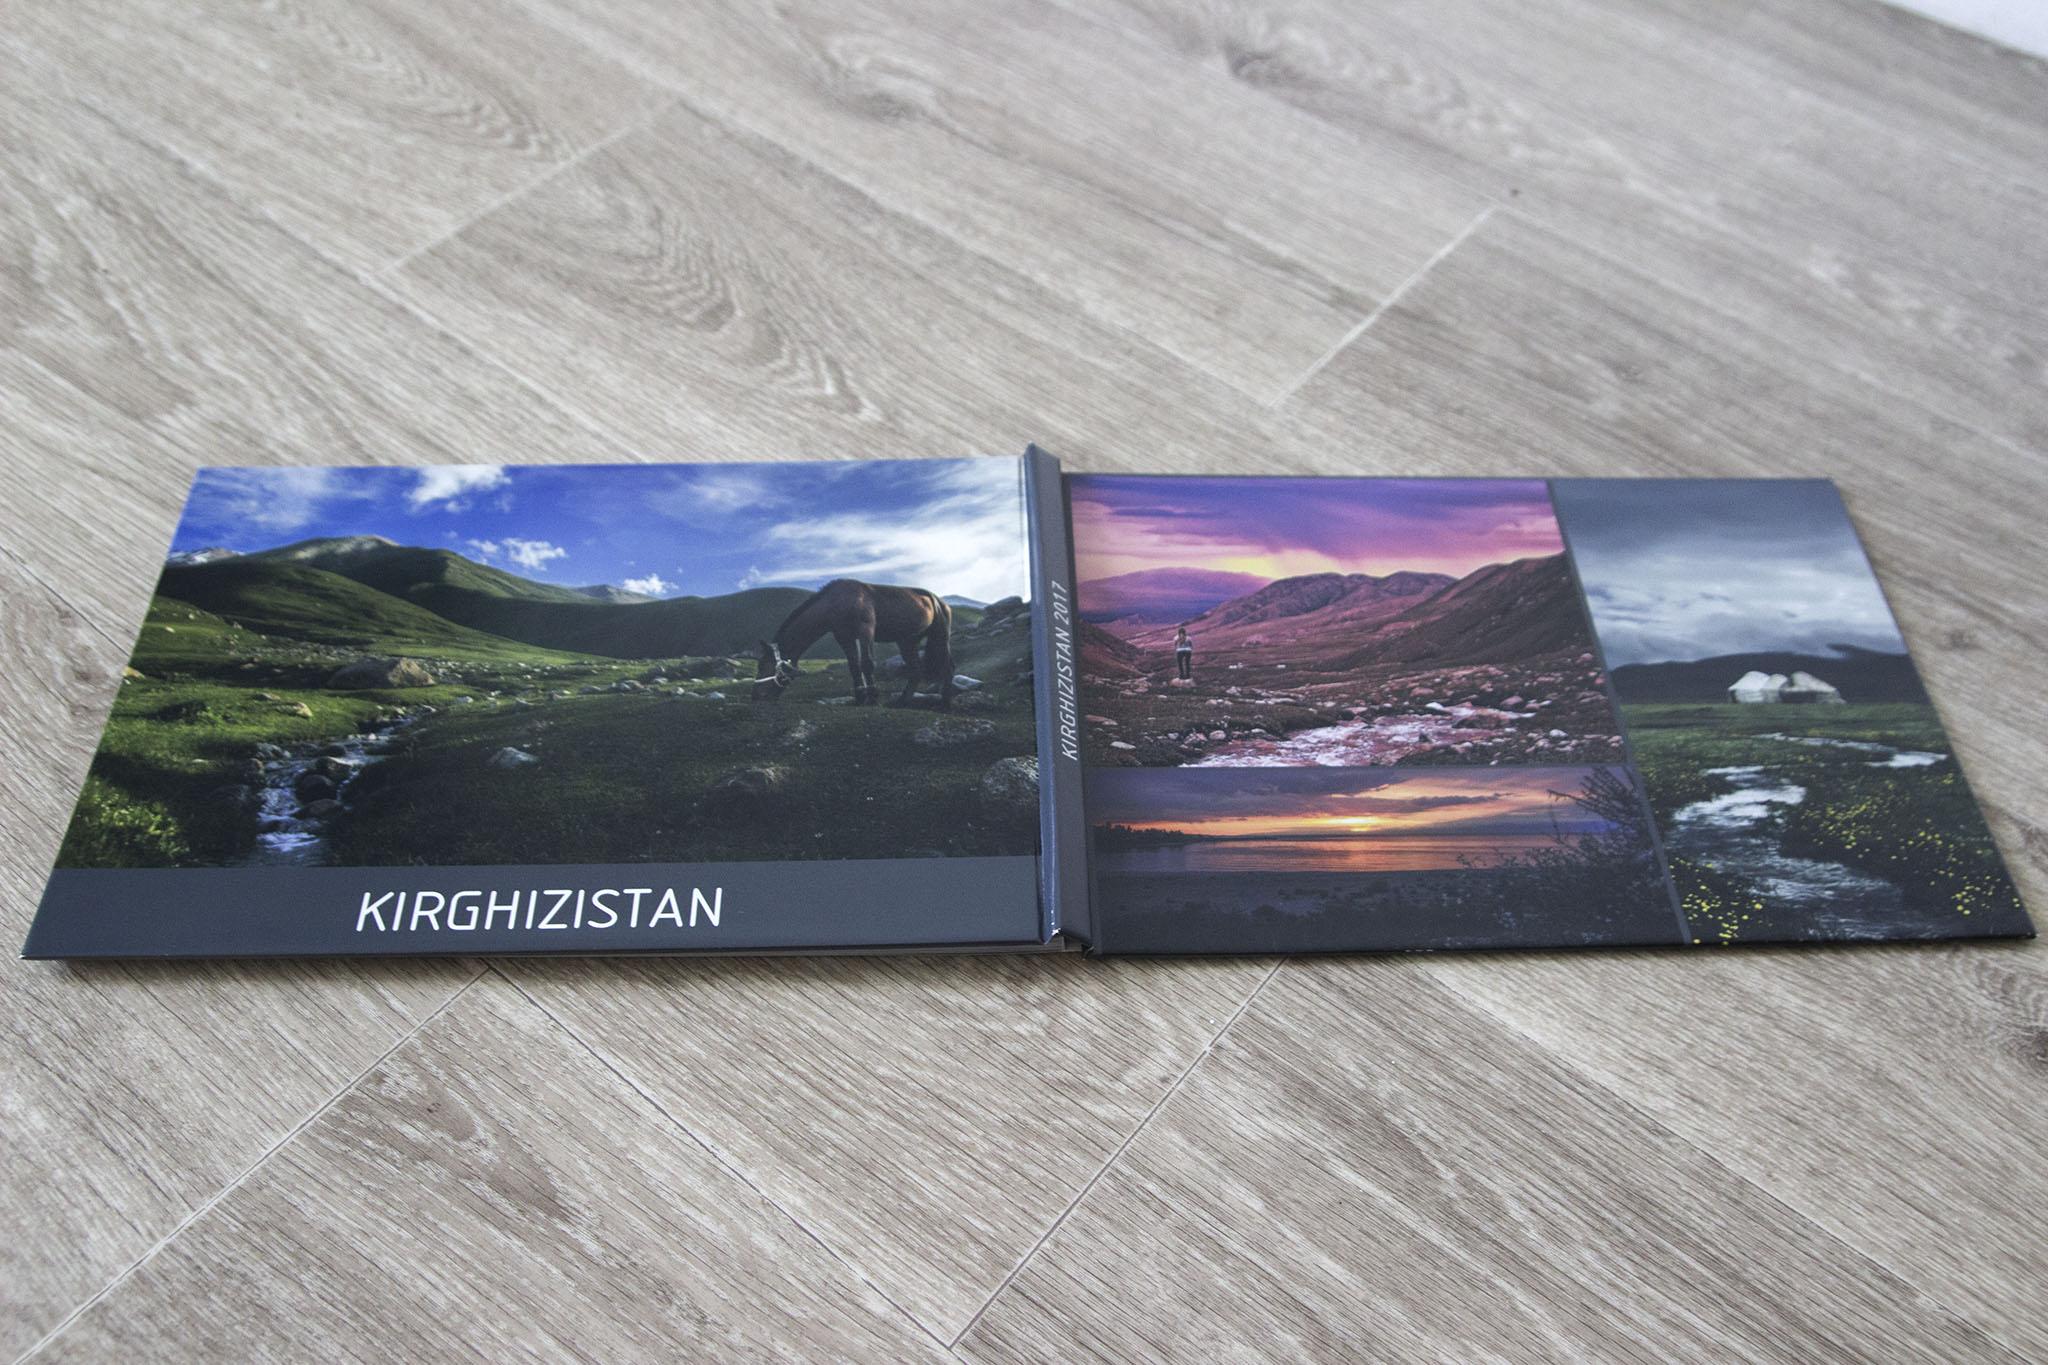 Un des livres photos crée via Myfujifilm